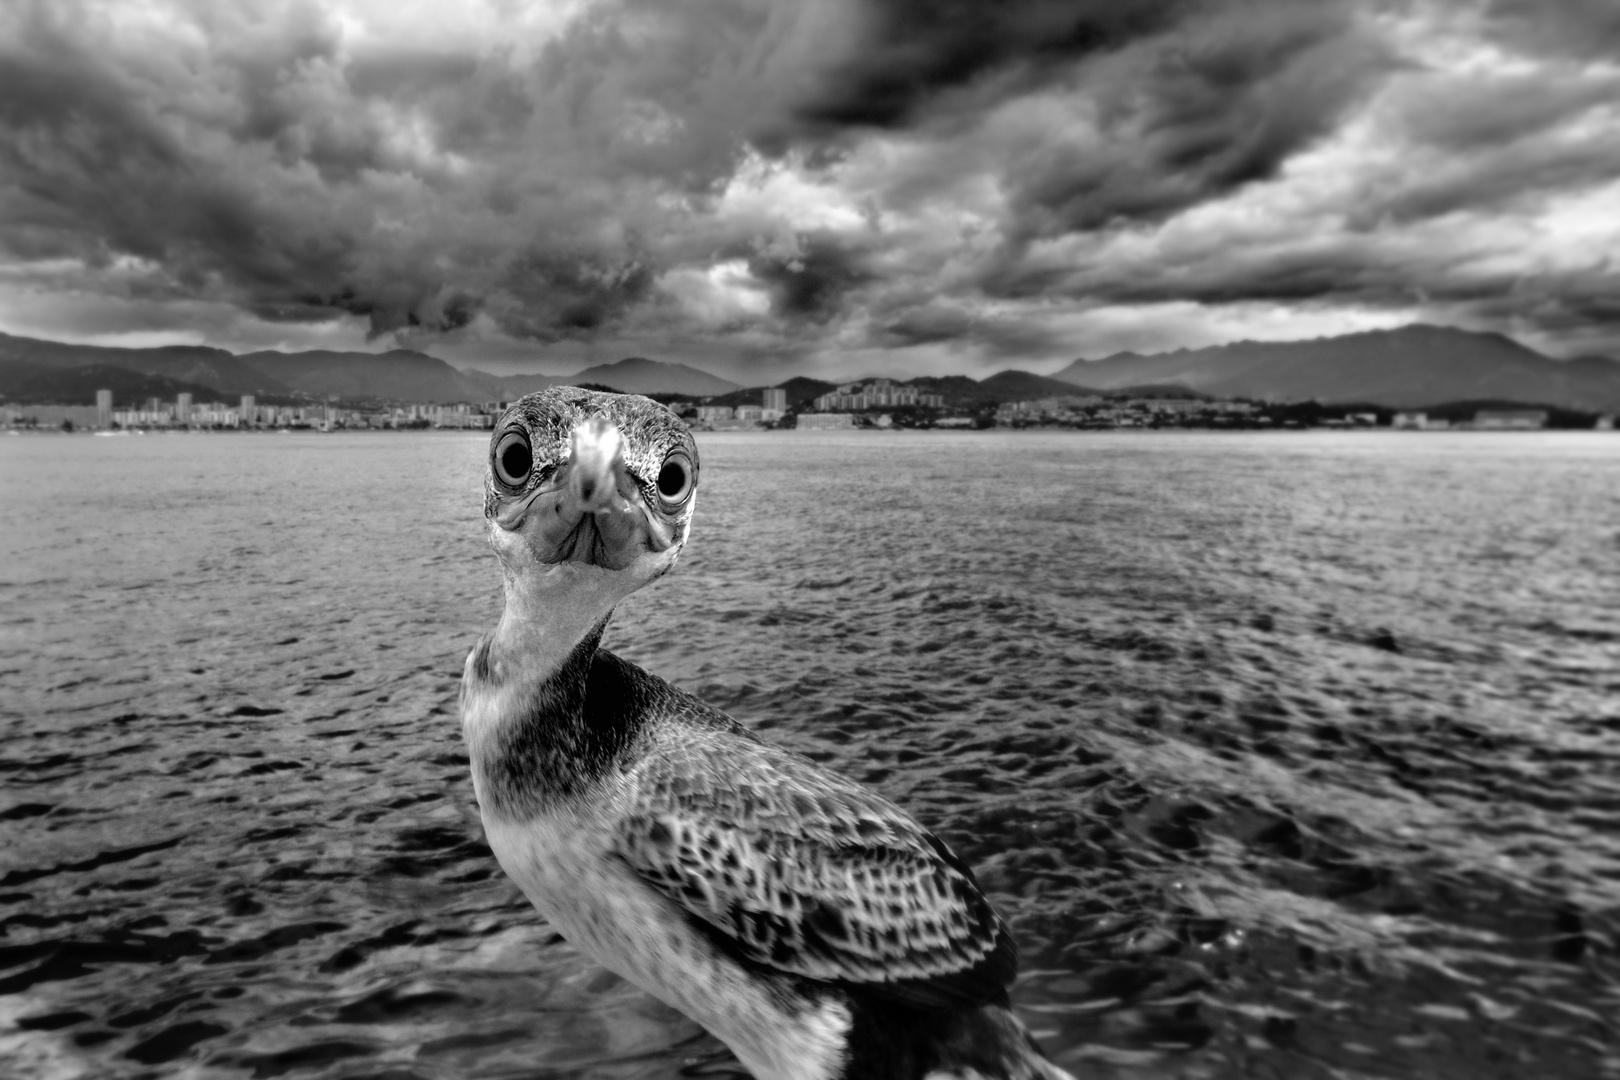 Mon copain le cormoran, gardien improvisé du port Tino Rossi à Ajaccio